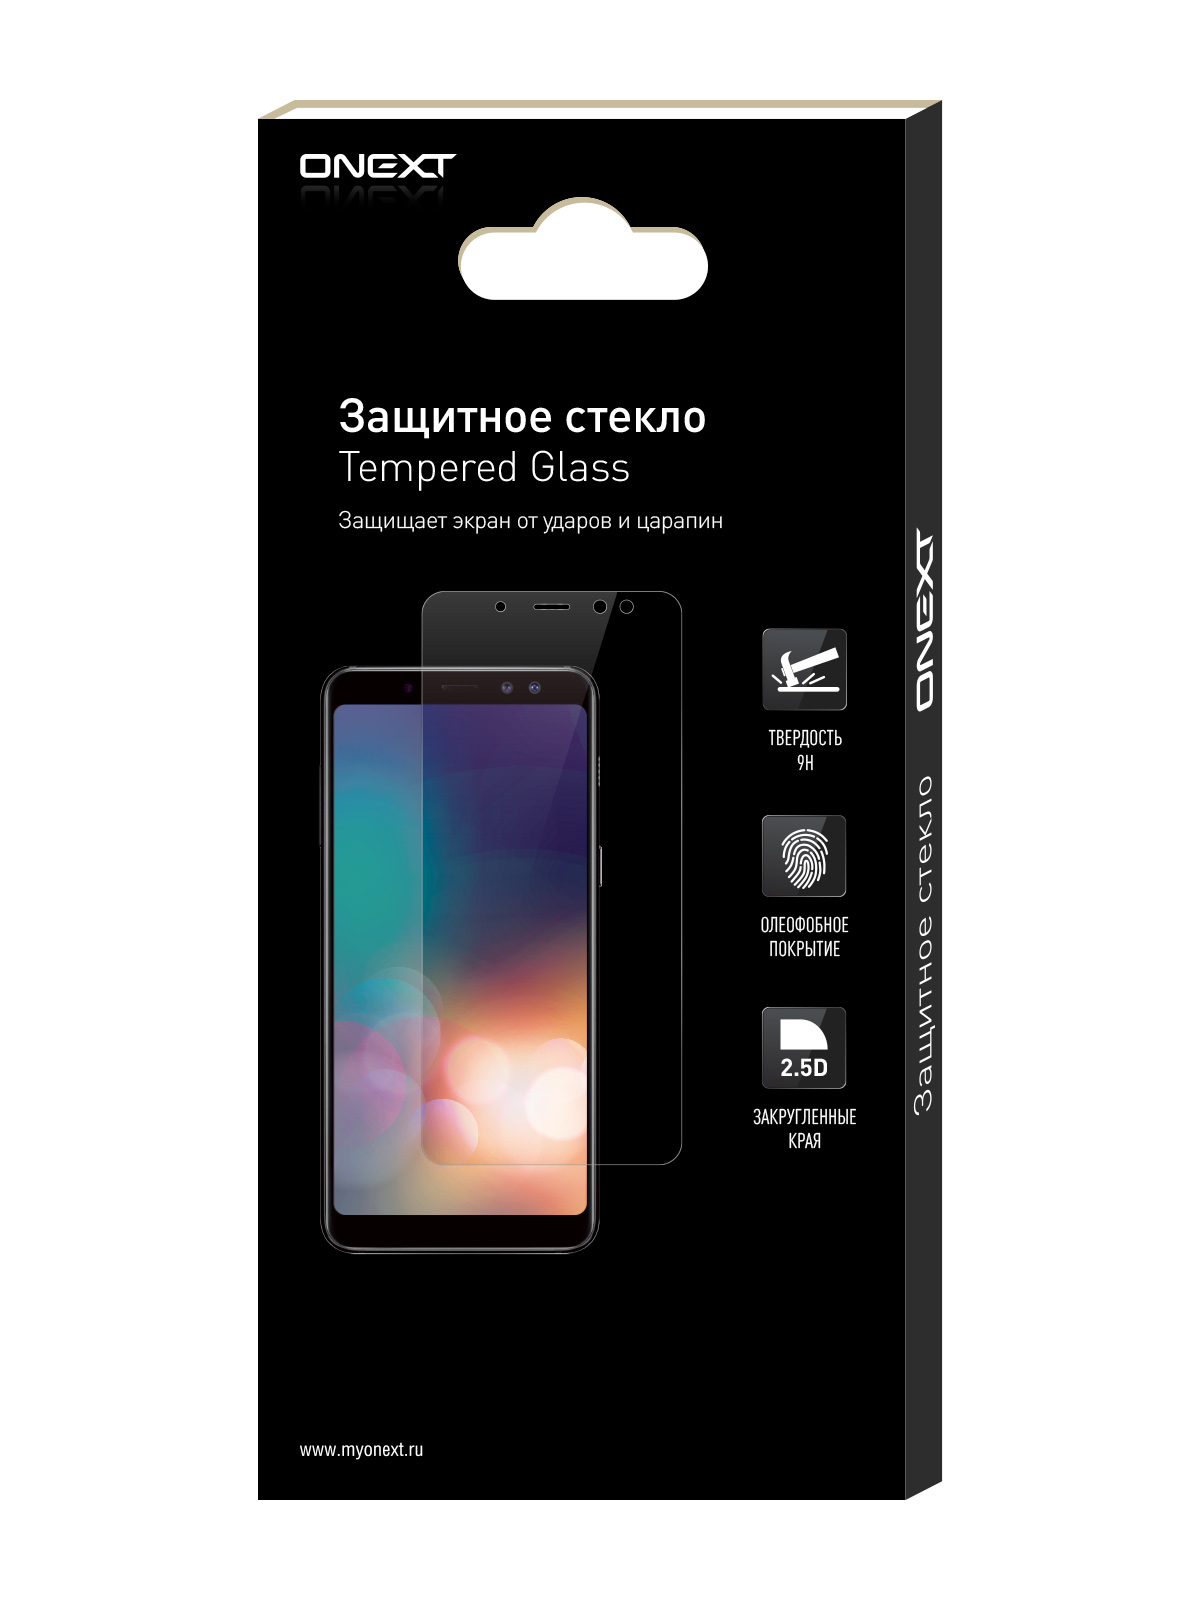 Защитное стекло ONEXT для Xiaomi Redmi Note 6 Pro (2018)